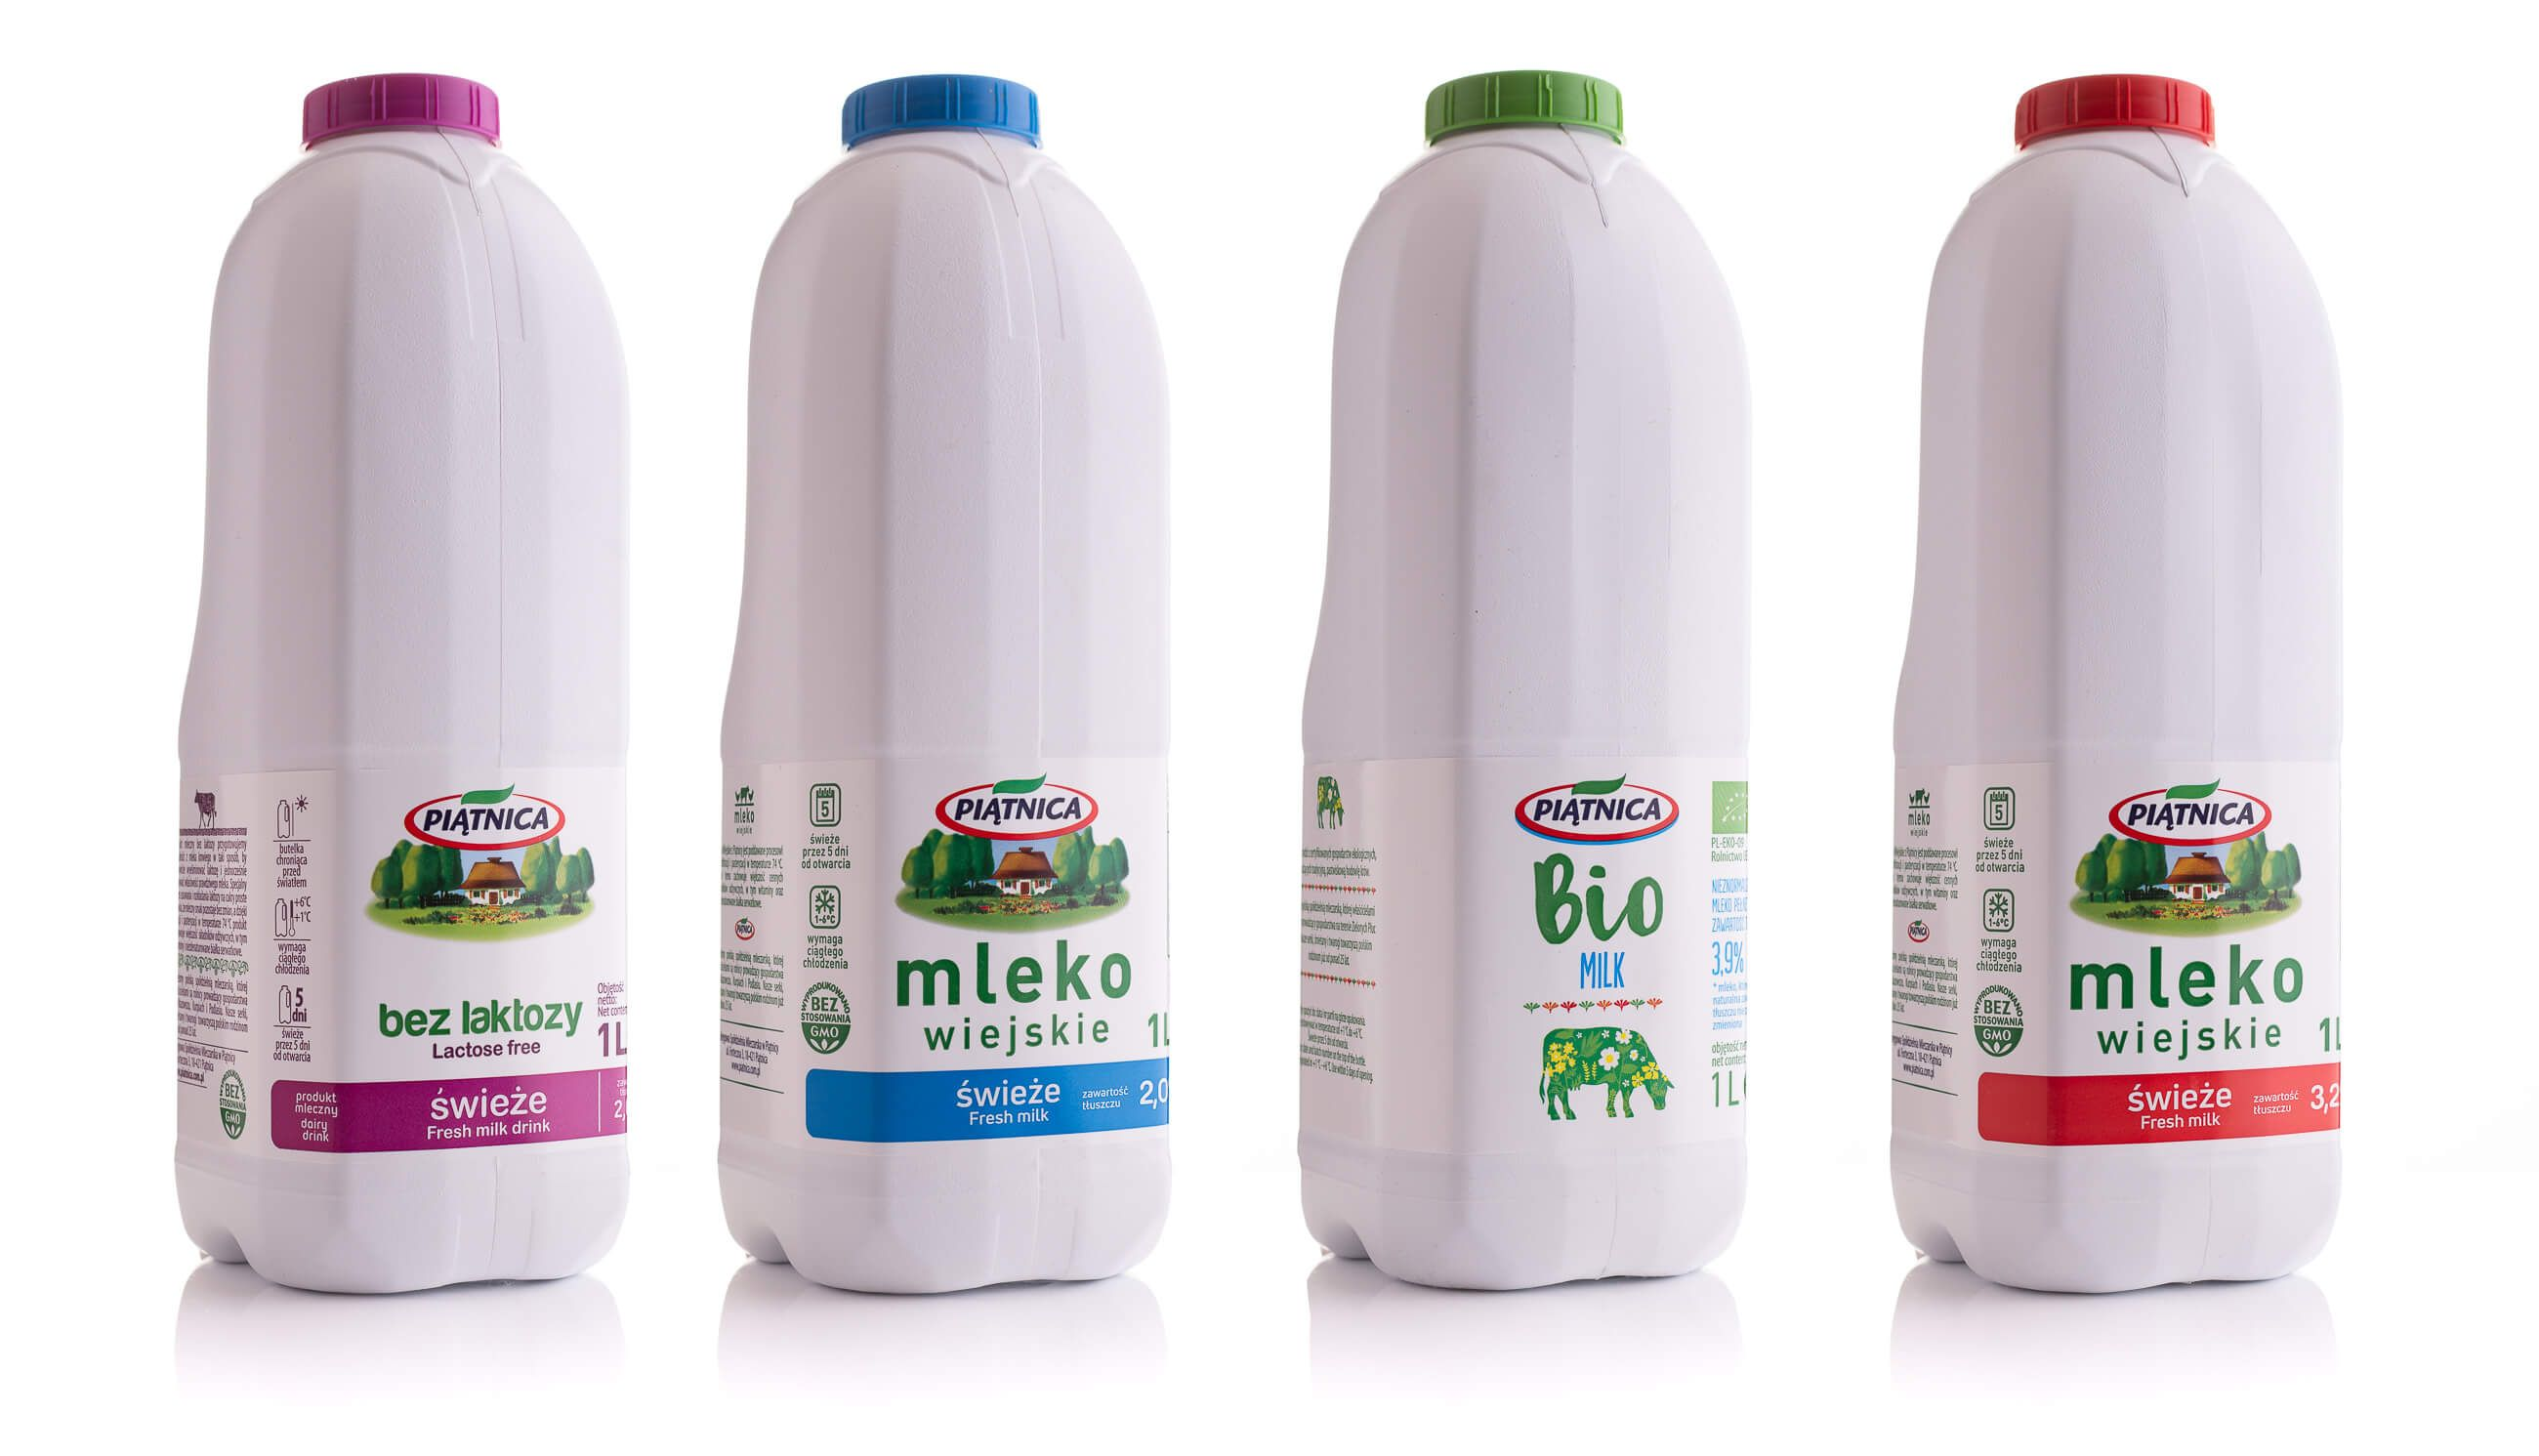 Packshot 4 różnych rodzajów butelek mleka marki Piątnica